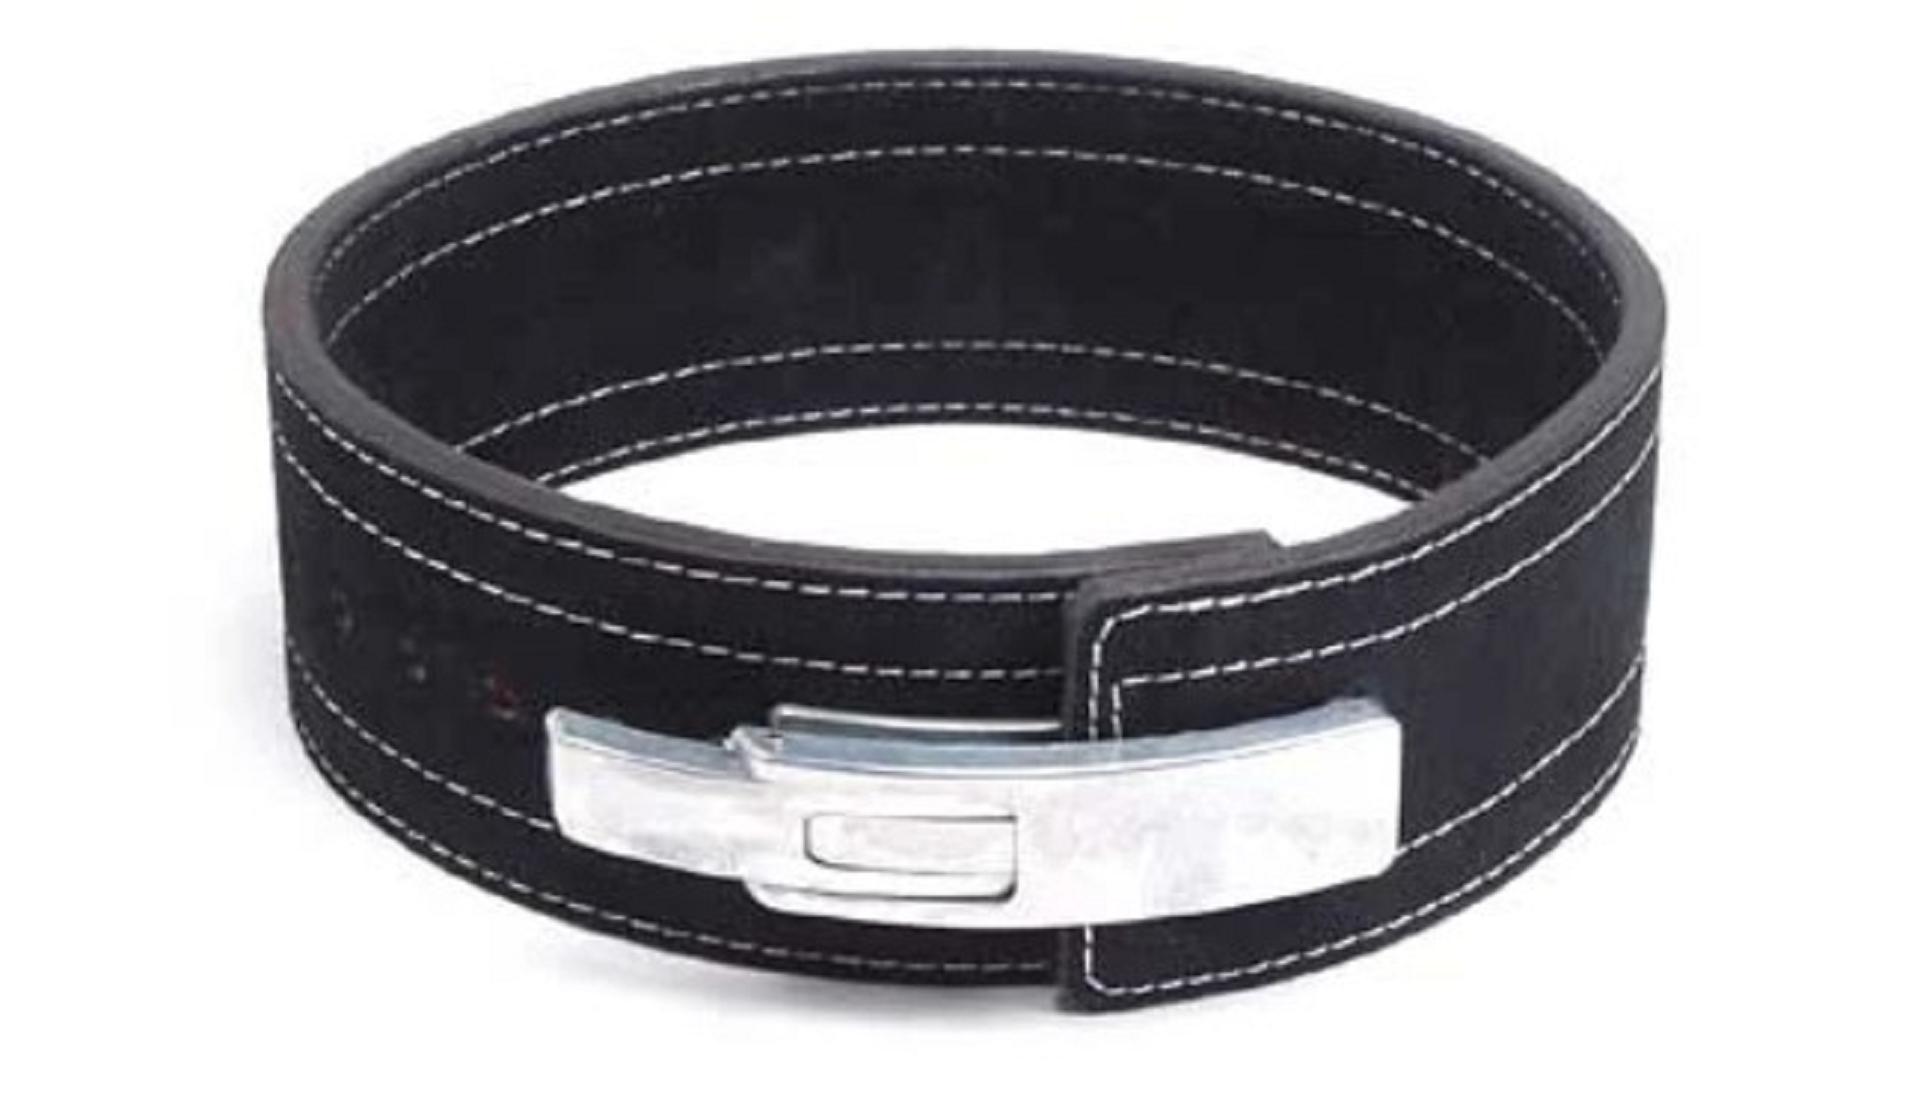 Iinzer advance designs forever lever belt